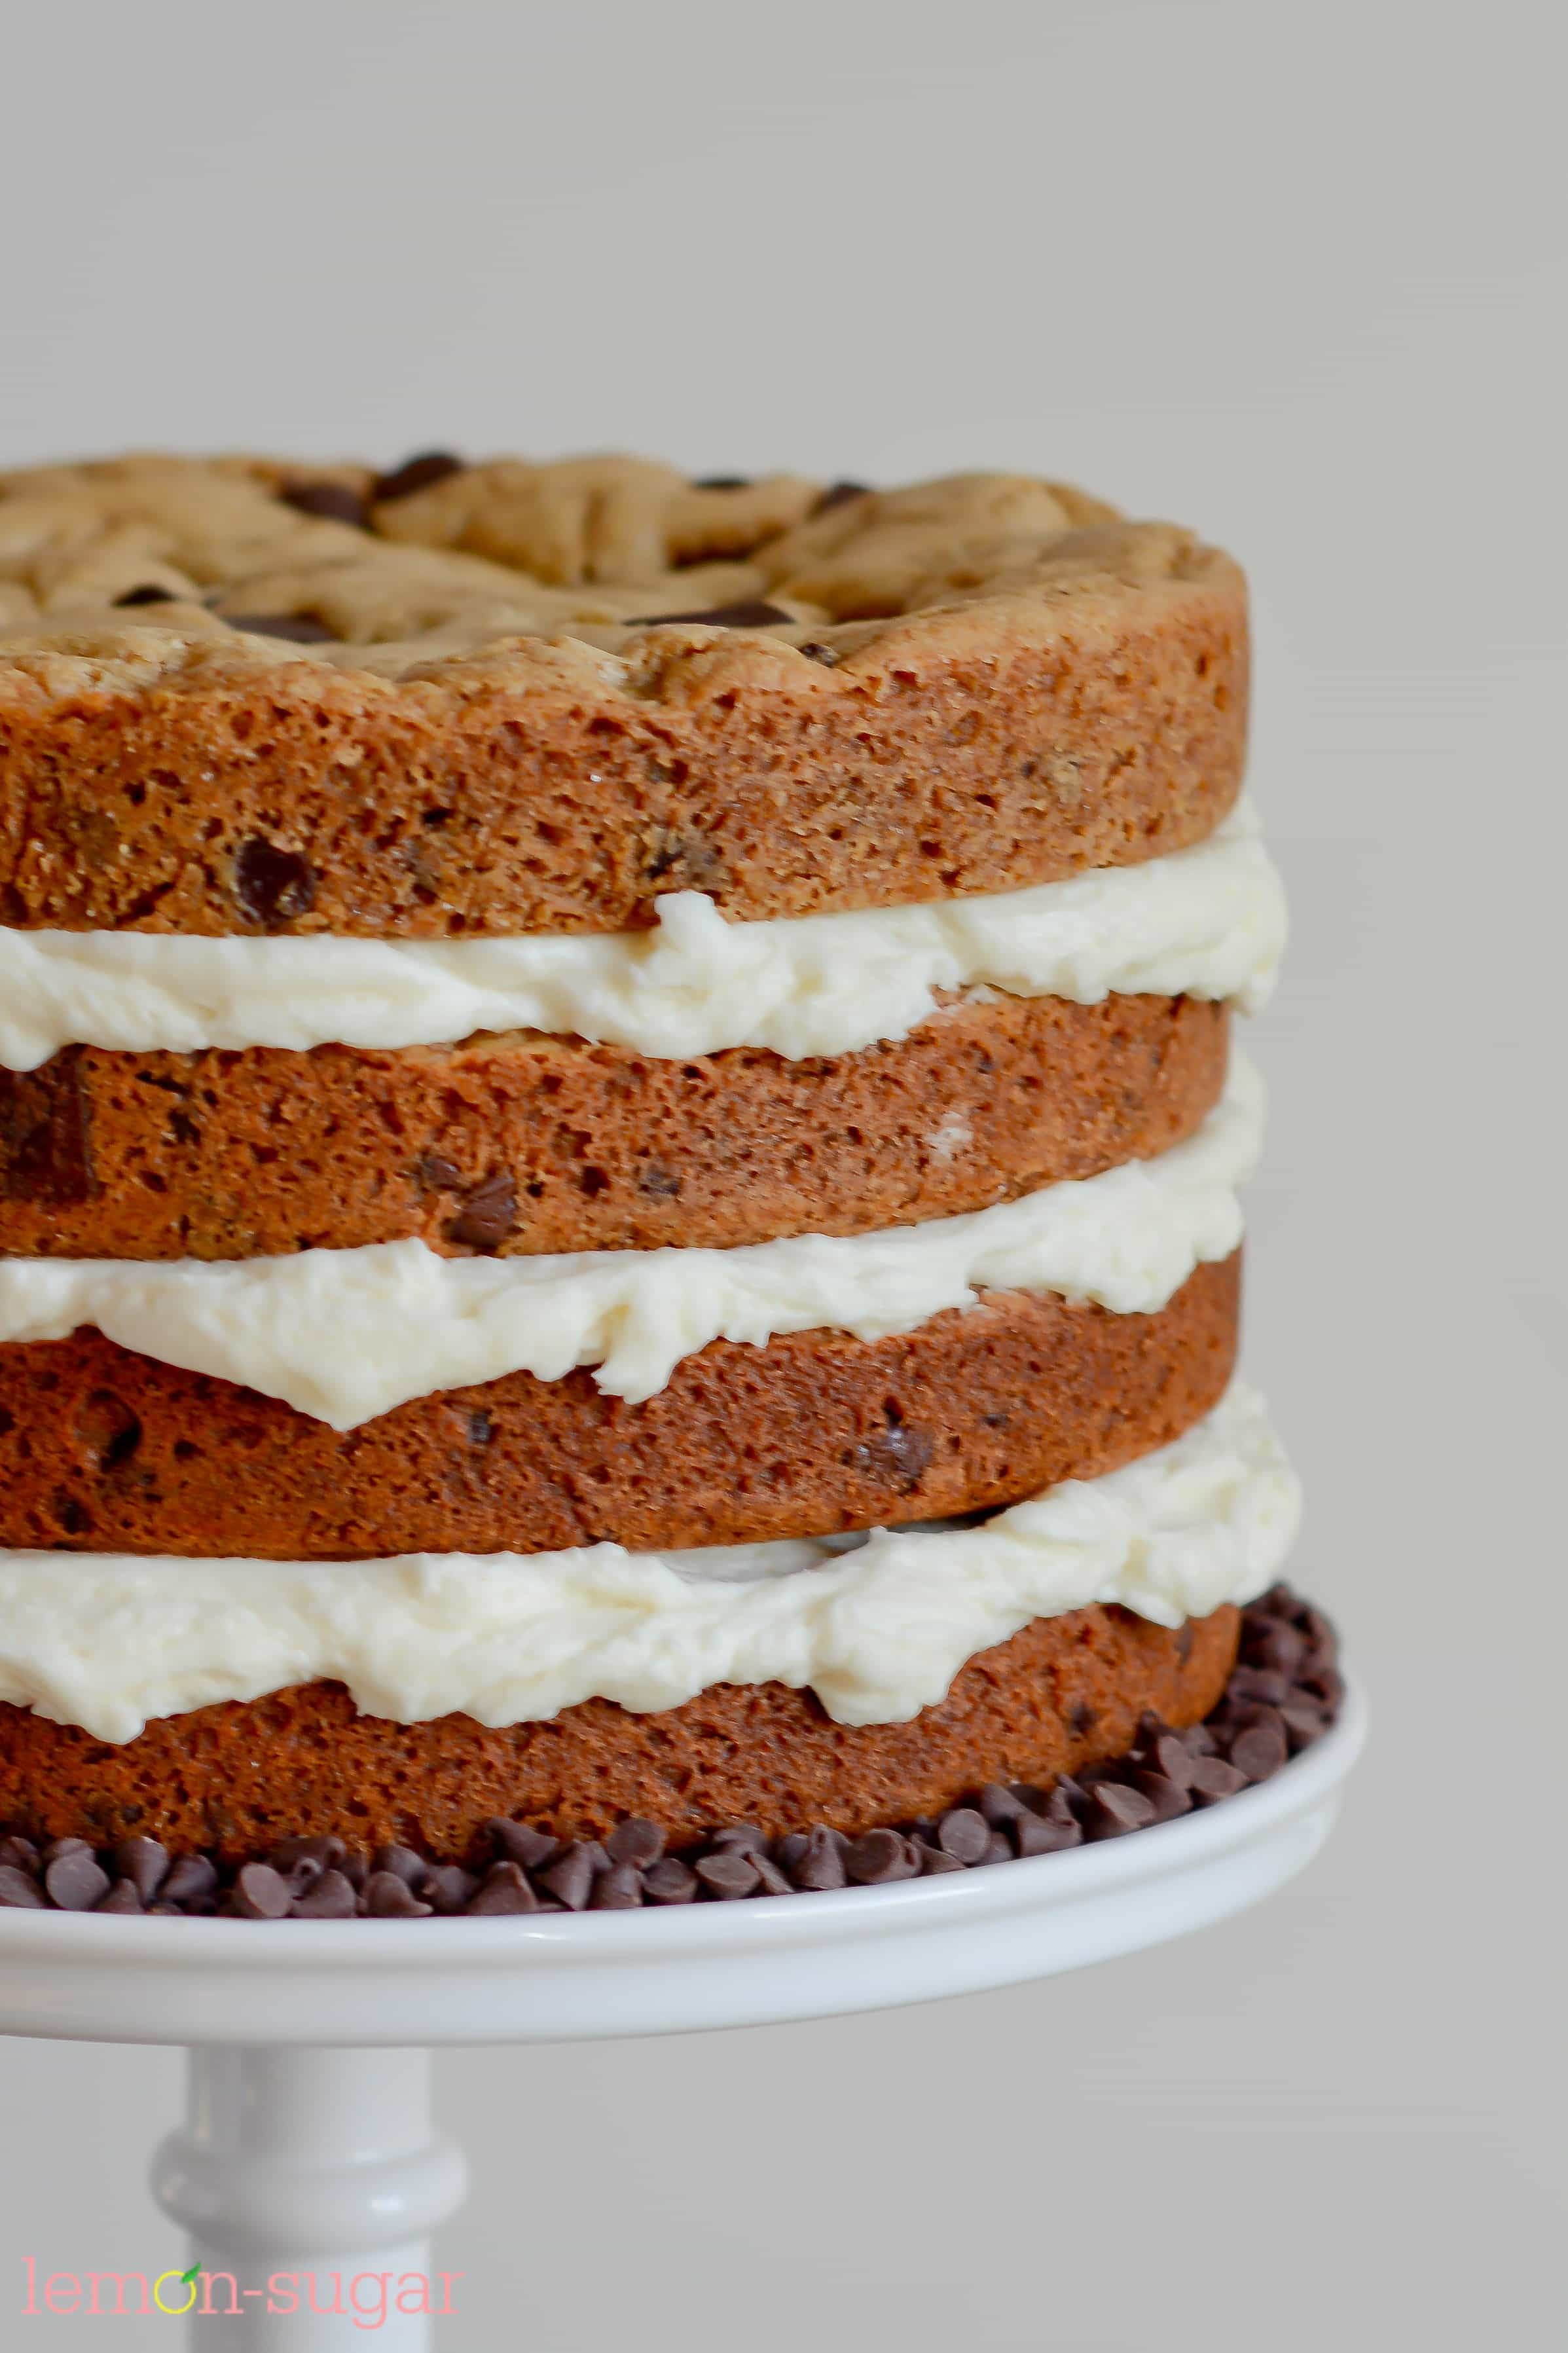 Chocolate Chip Cookie Cake  Chocolate Chip Cookie Layer Cake Lemon Sugar